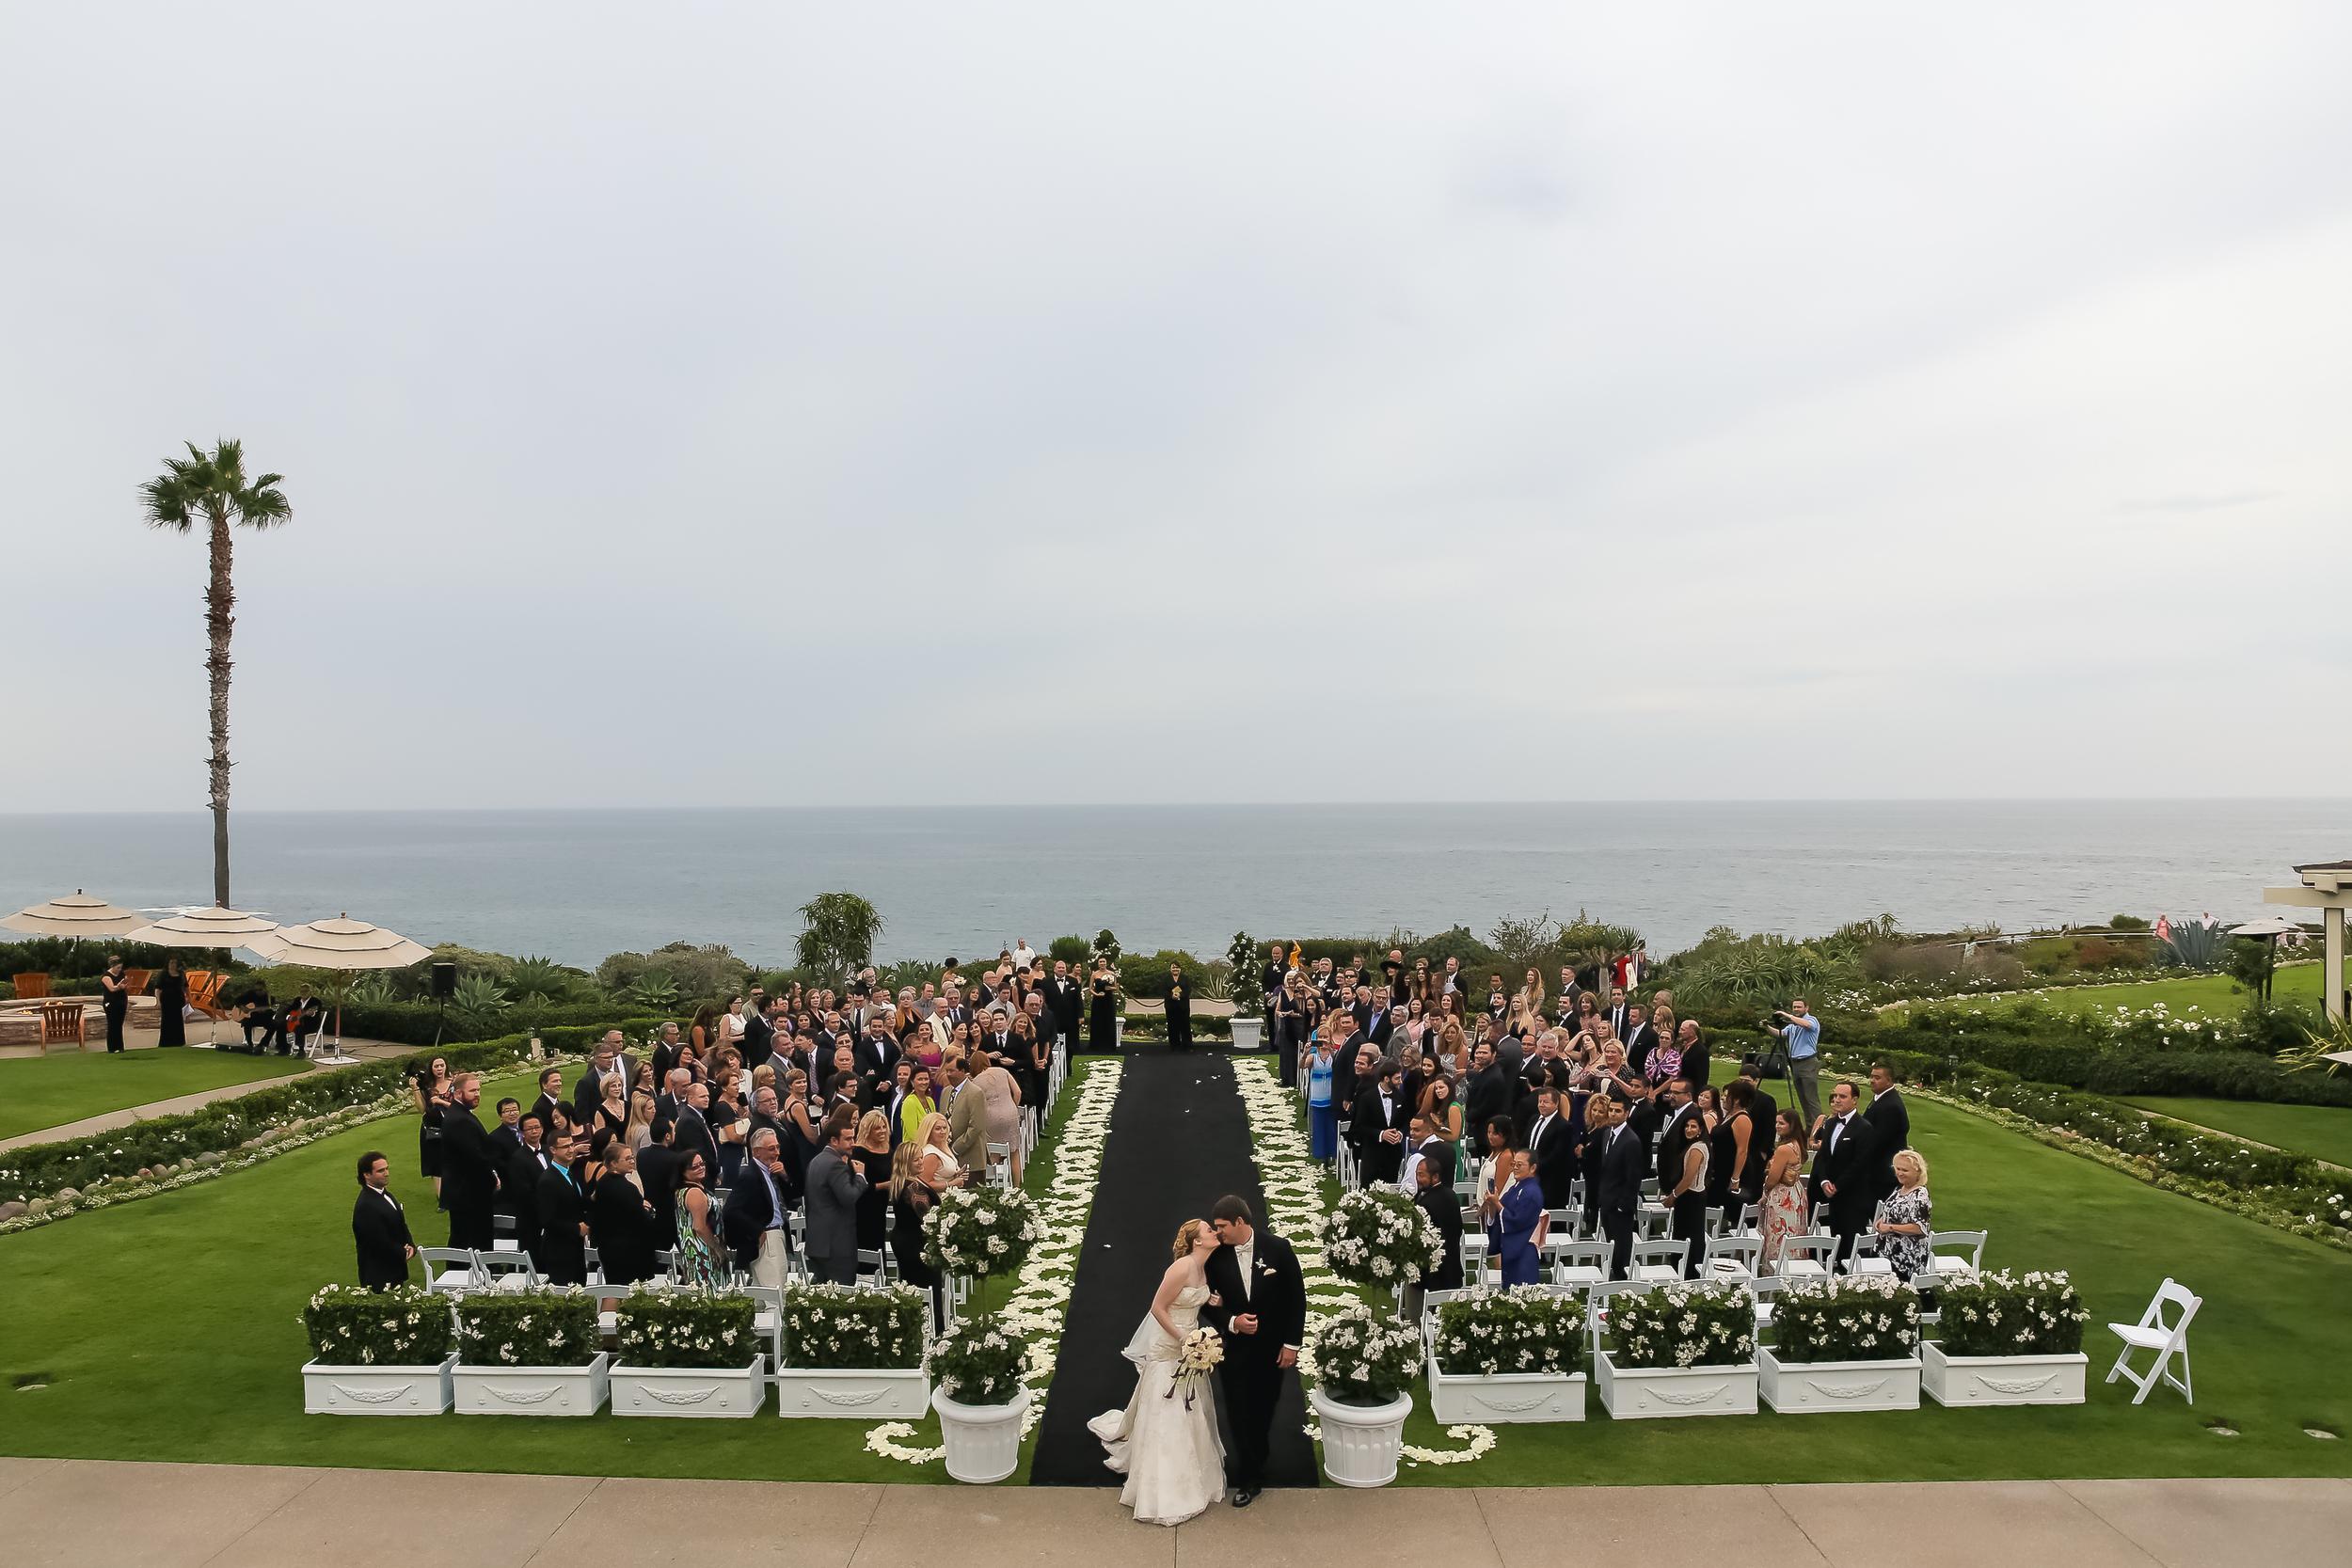 MONTAGE-LAGUNA-BEACH-OUTDOOR-WEDDING-CEREMONY_002.jpg